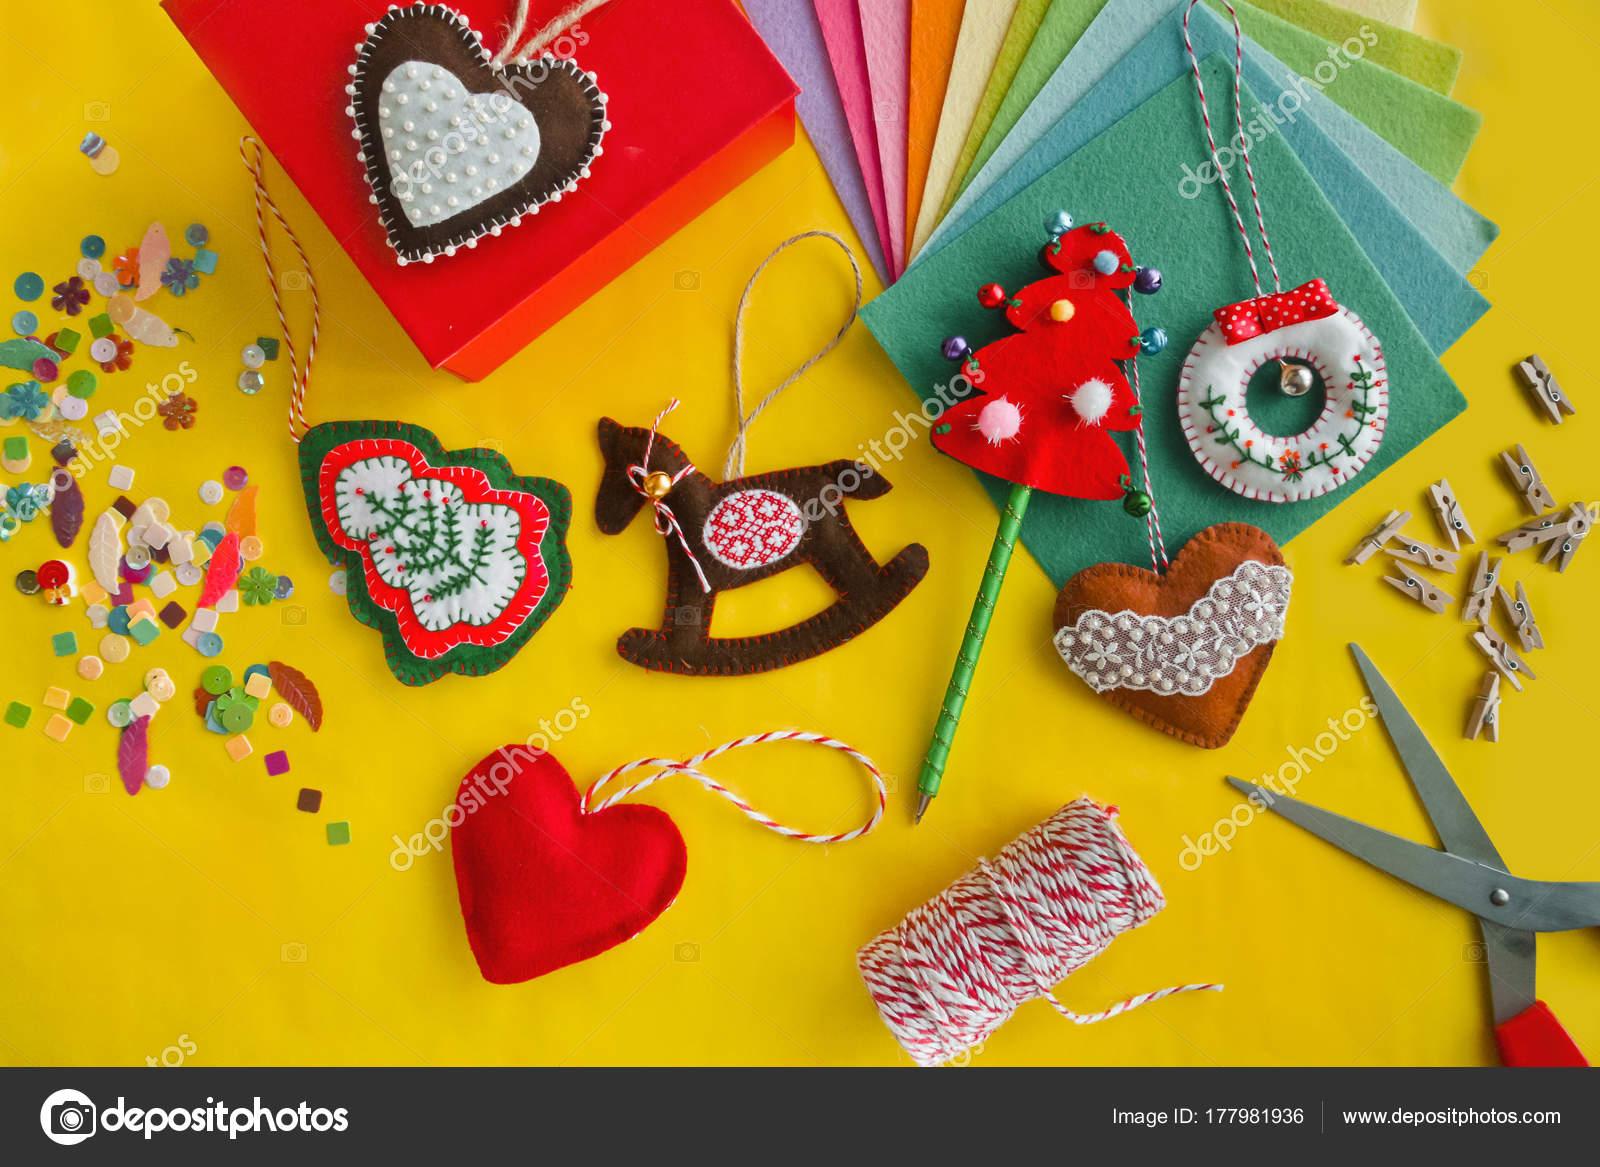 Easy Christmas Craft Adult Kids Make Felt Heart Rocking Horse